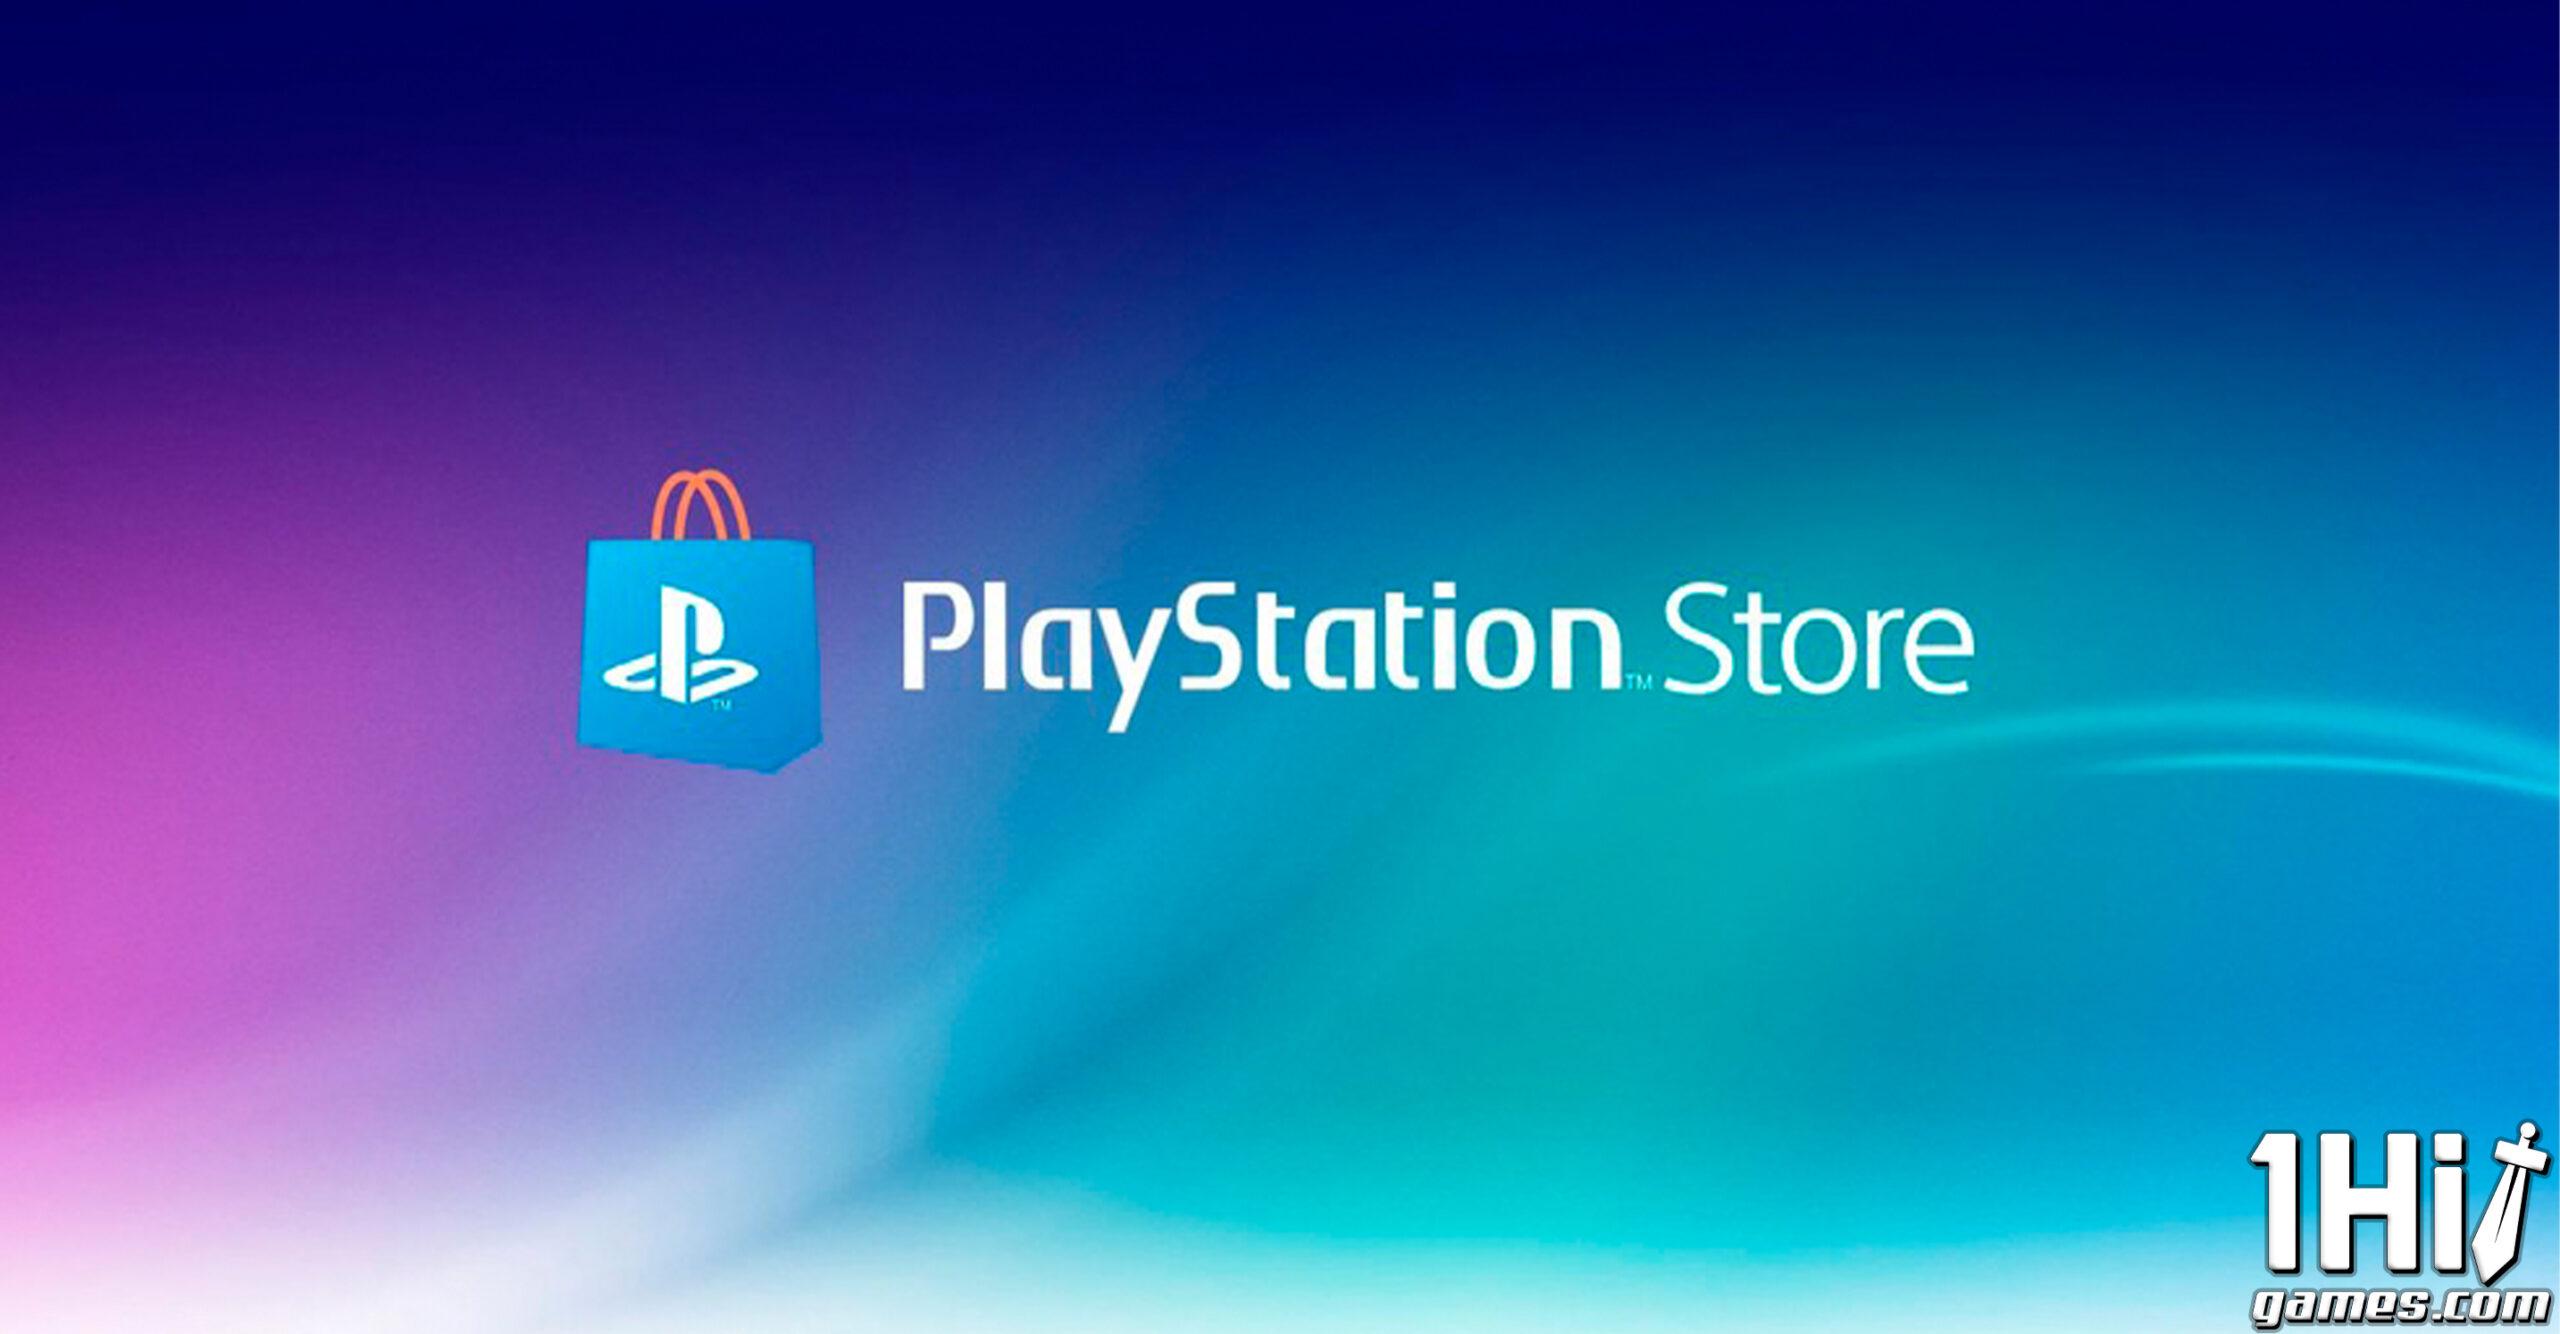 Sony desativa a PlayStation Store para PS3, PS Vita e PSP